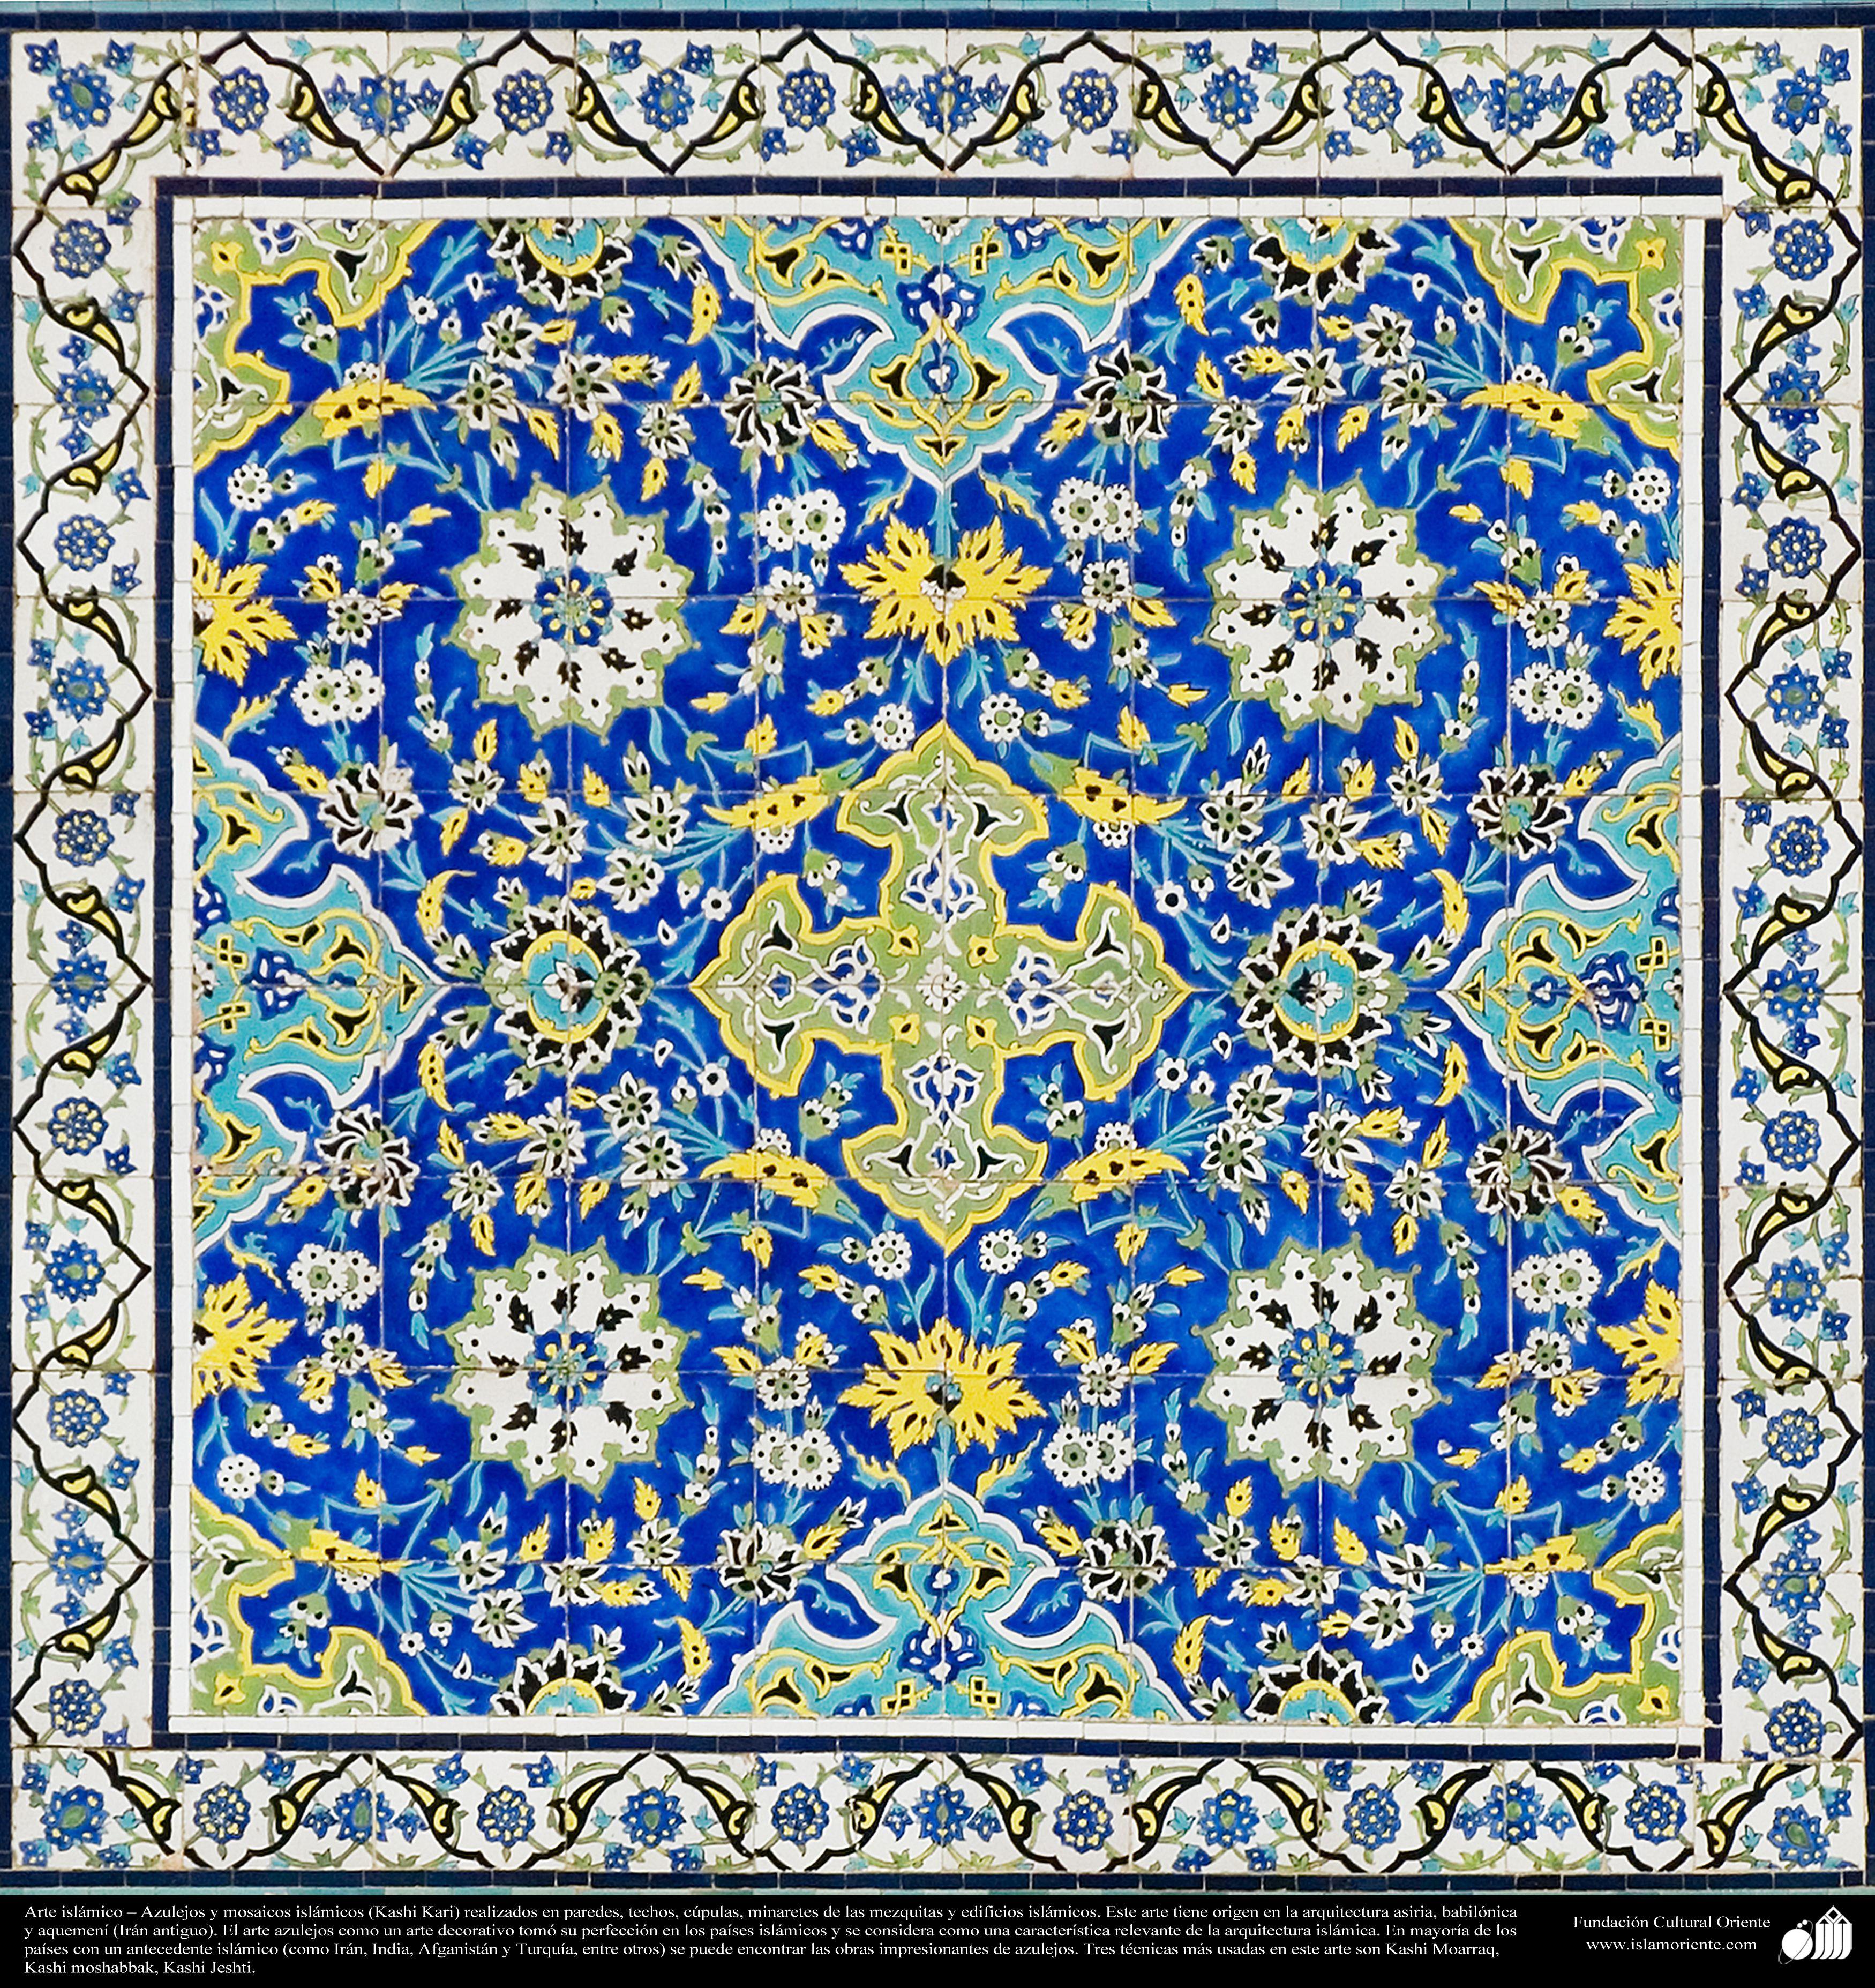 Iran Art Mosaic And Iran Tiles Kashi Kari Tile